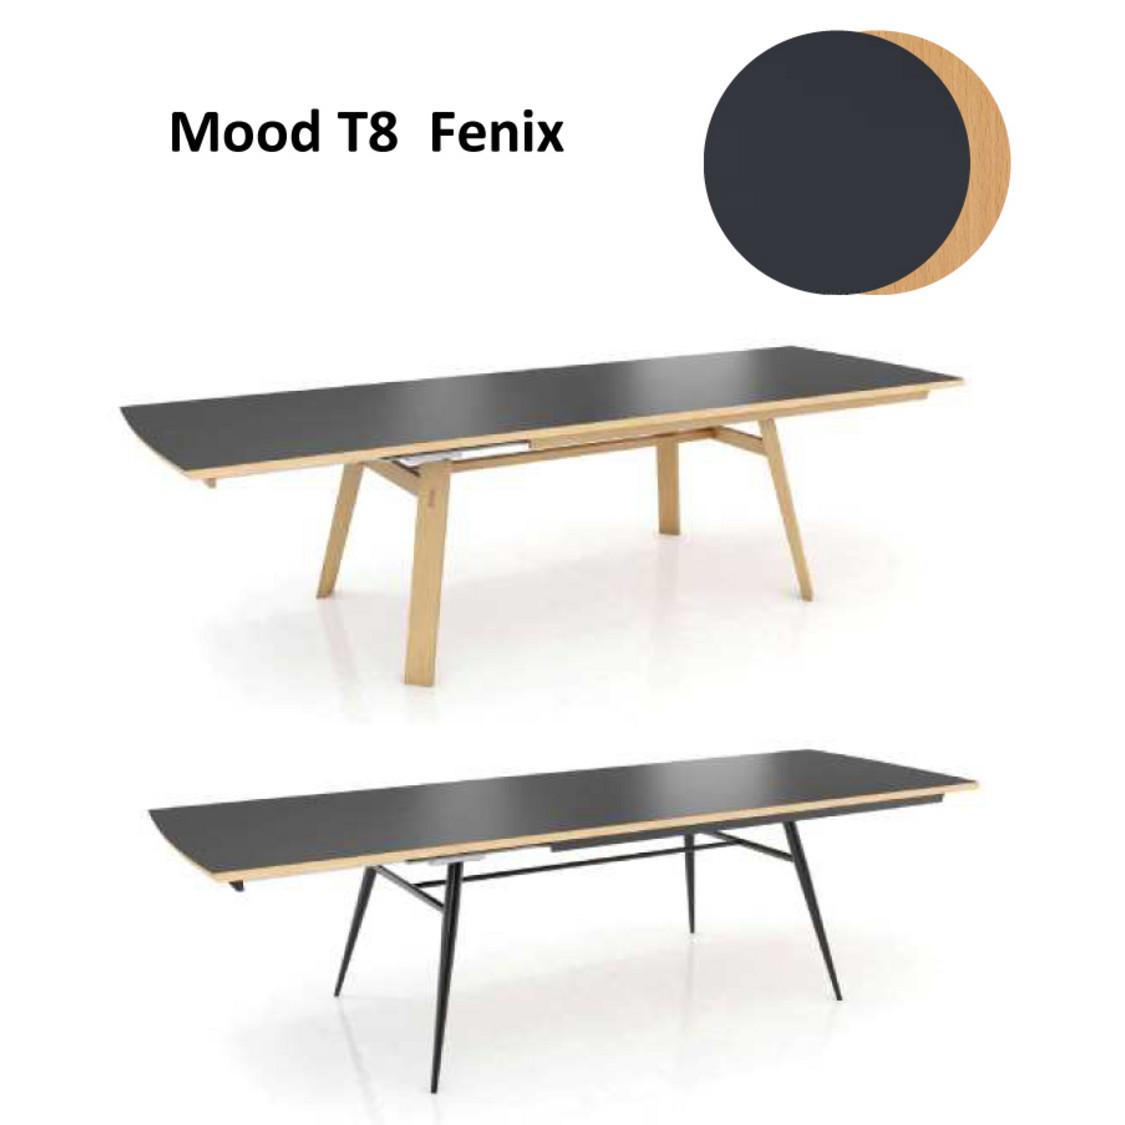 esstische mobel ehrmann. Black Bedroom Furniture Sets. Home Design Ideas